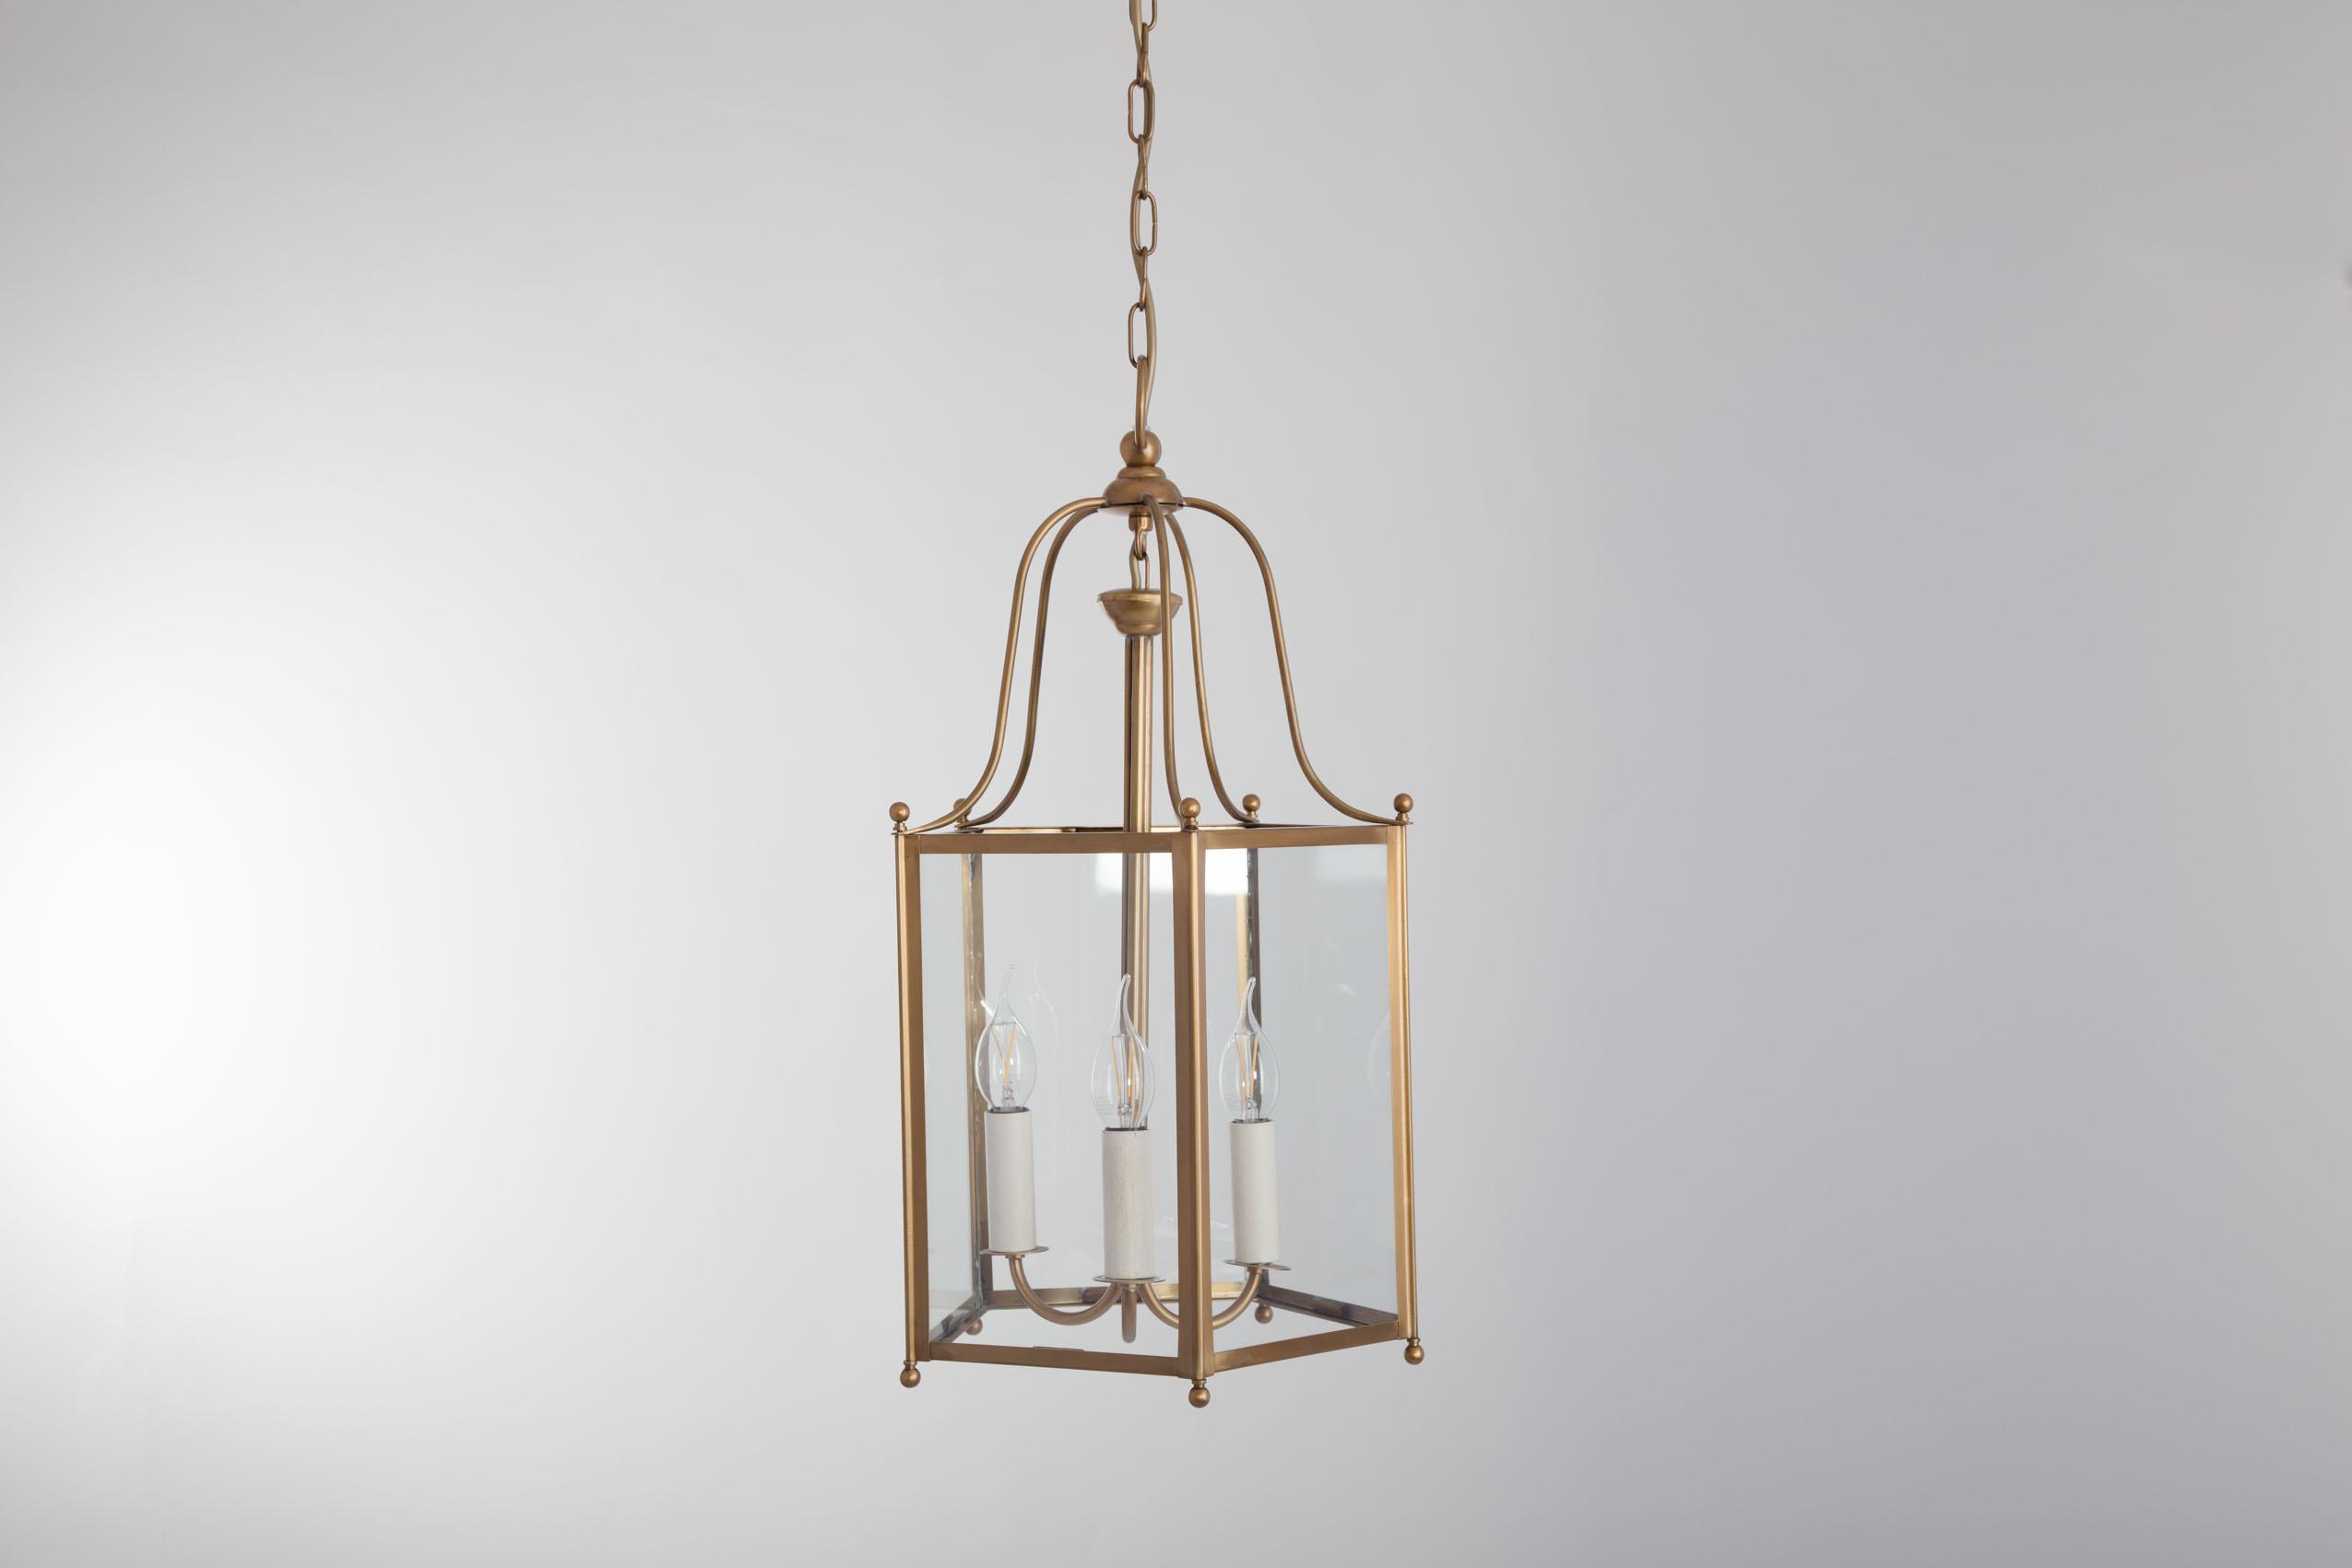 lanterne directoire gm 156 3 lum 39 art. Black Bedroom Furniture Sets. Home Design Ideas